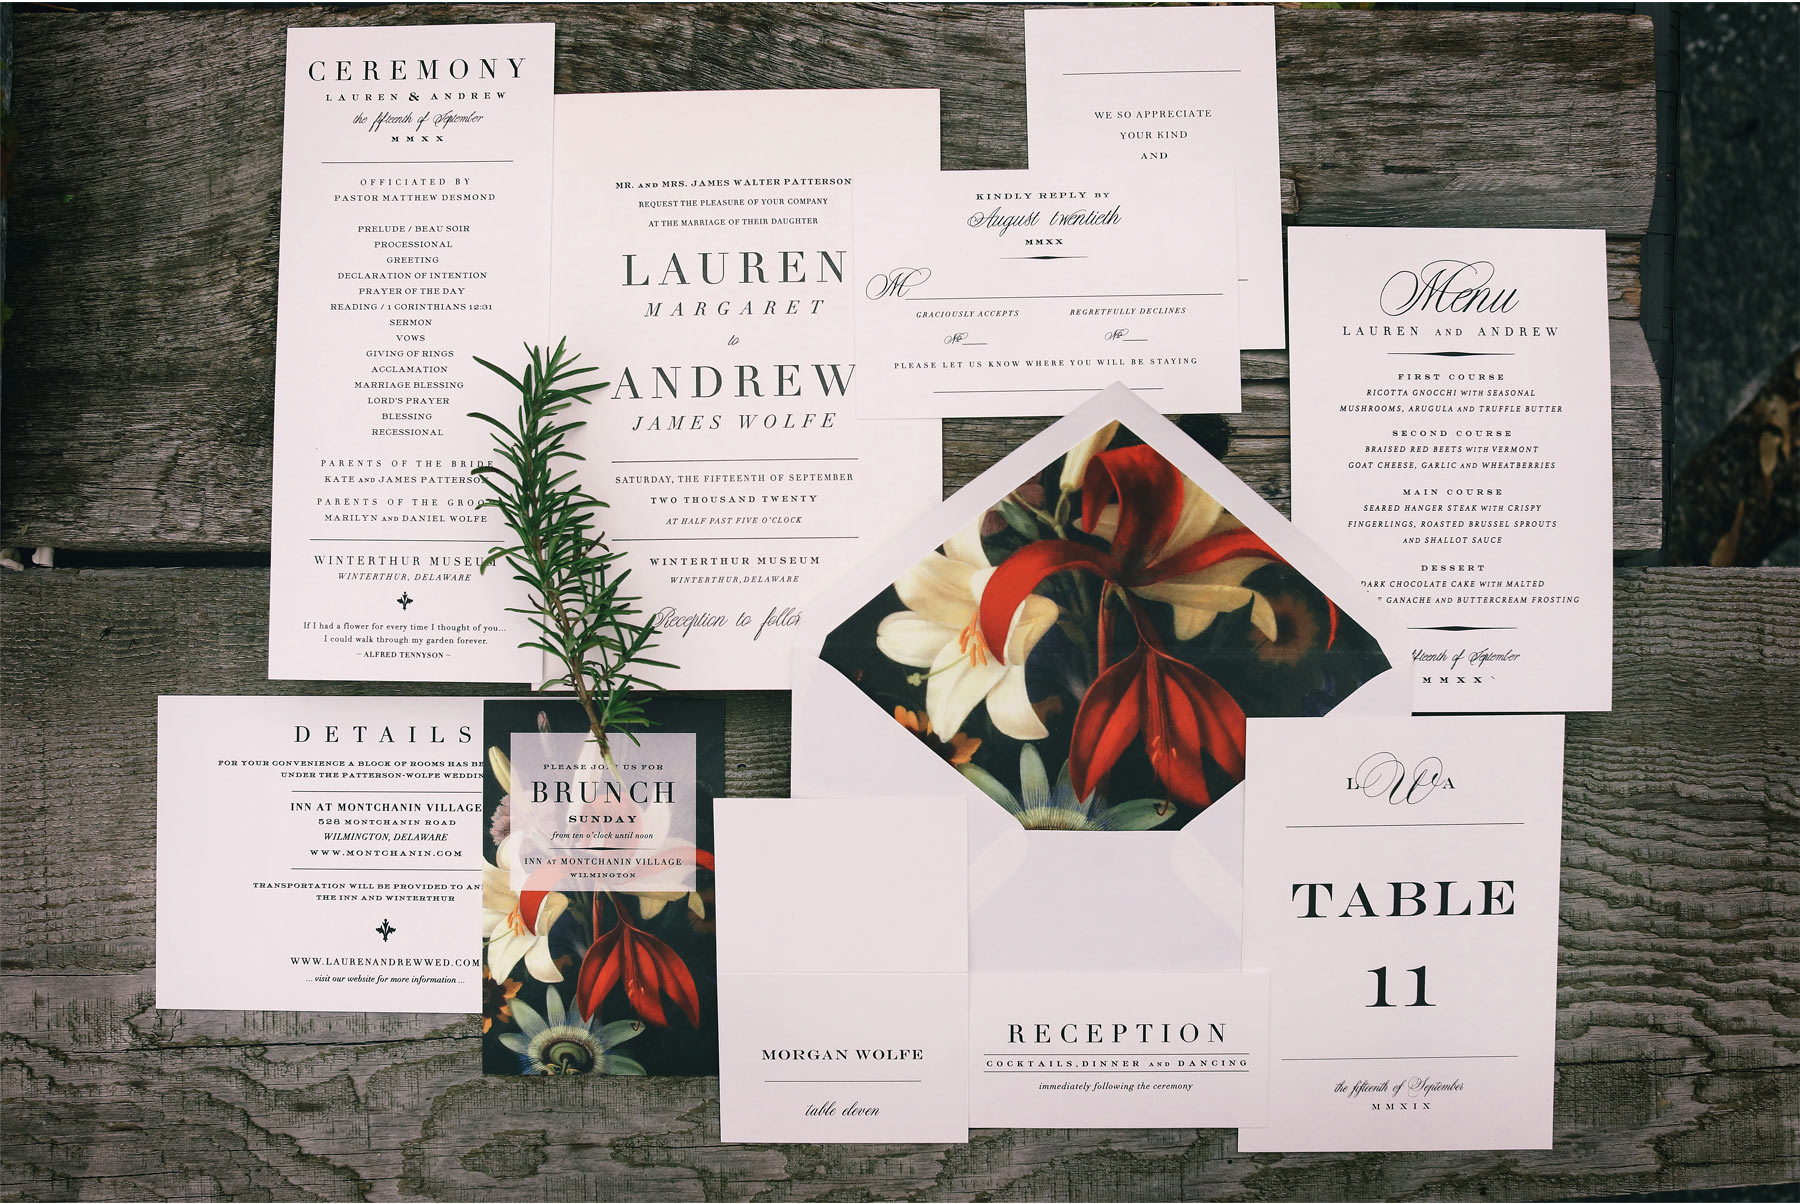 13-Ashery-Lane-Farm-Minneapolis-Minnesota-Wedding-Styled-Shoot-New-Venue-Barn-Orchard-Vineyard-Invitations-Flat-Lay.jpg